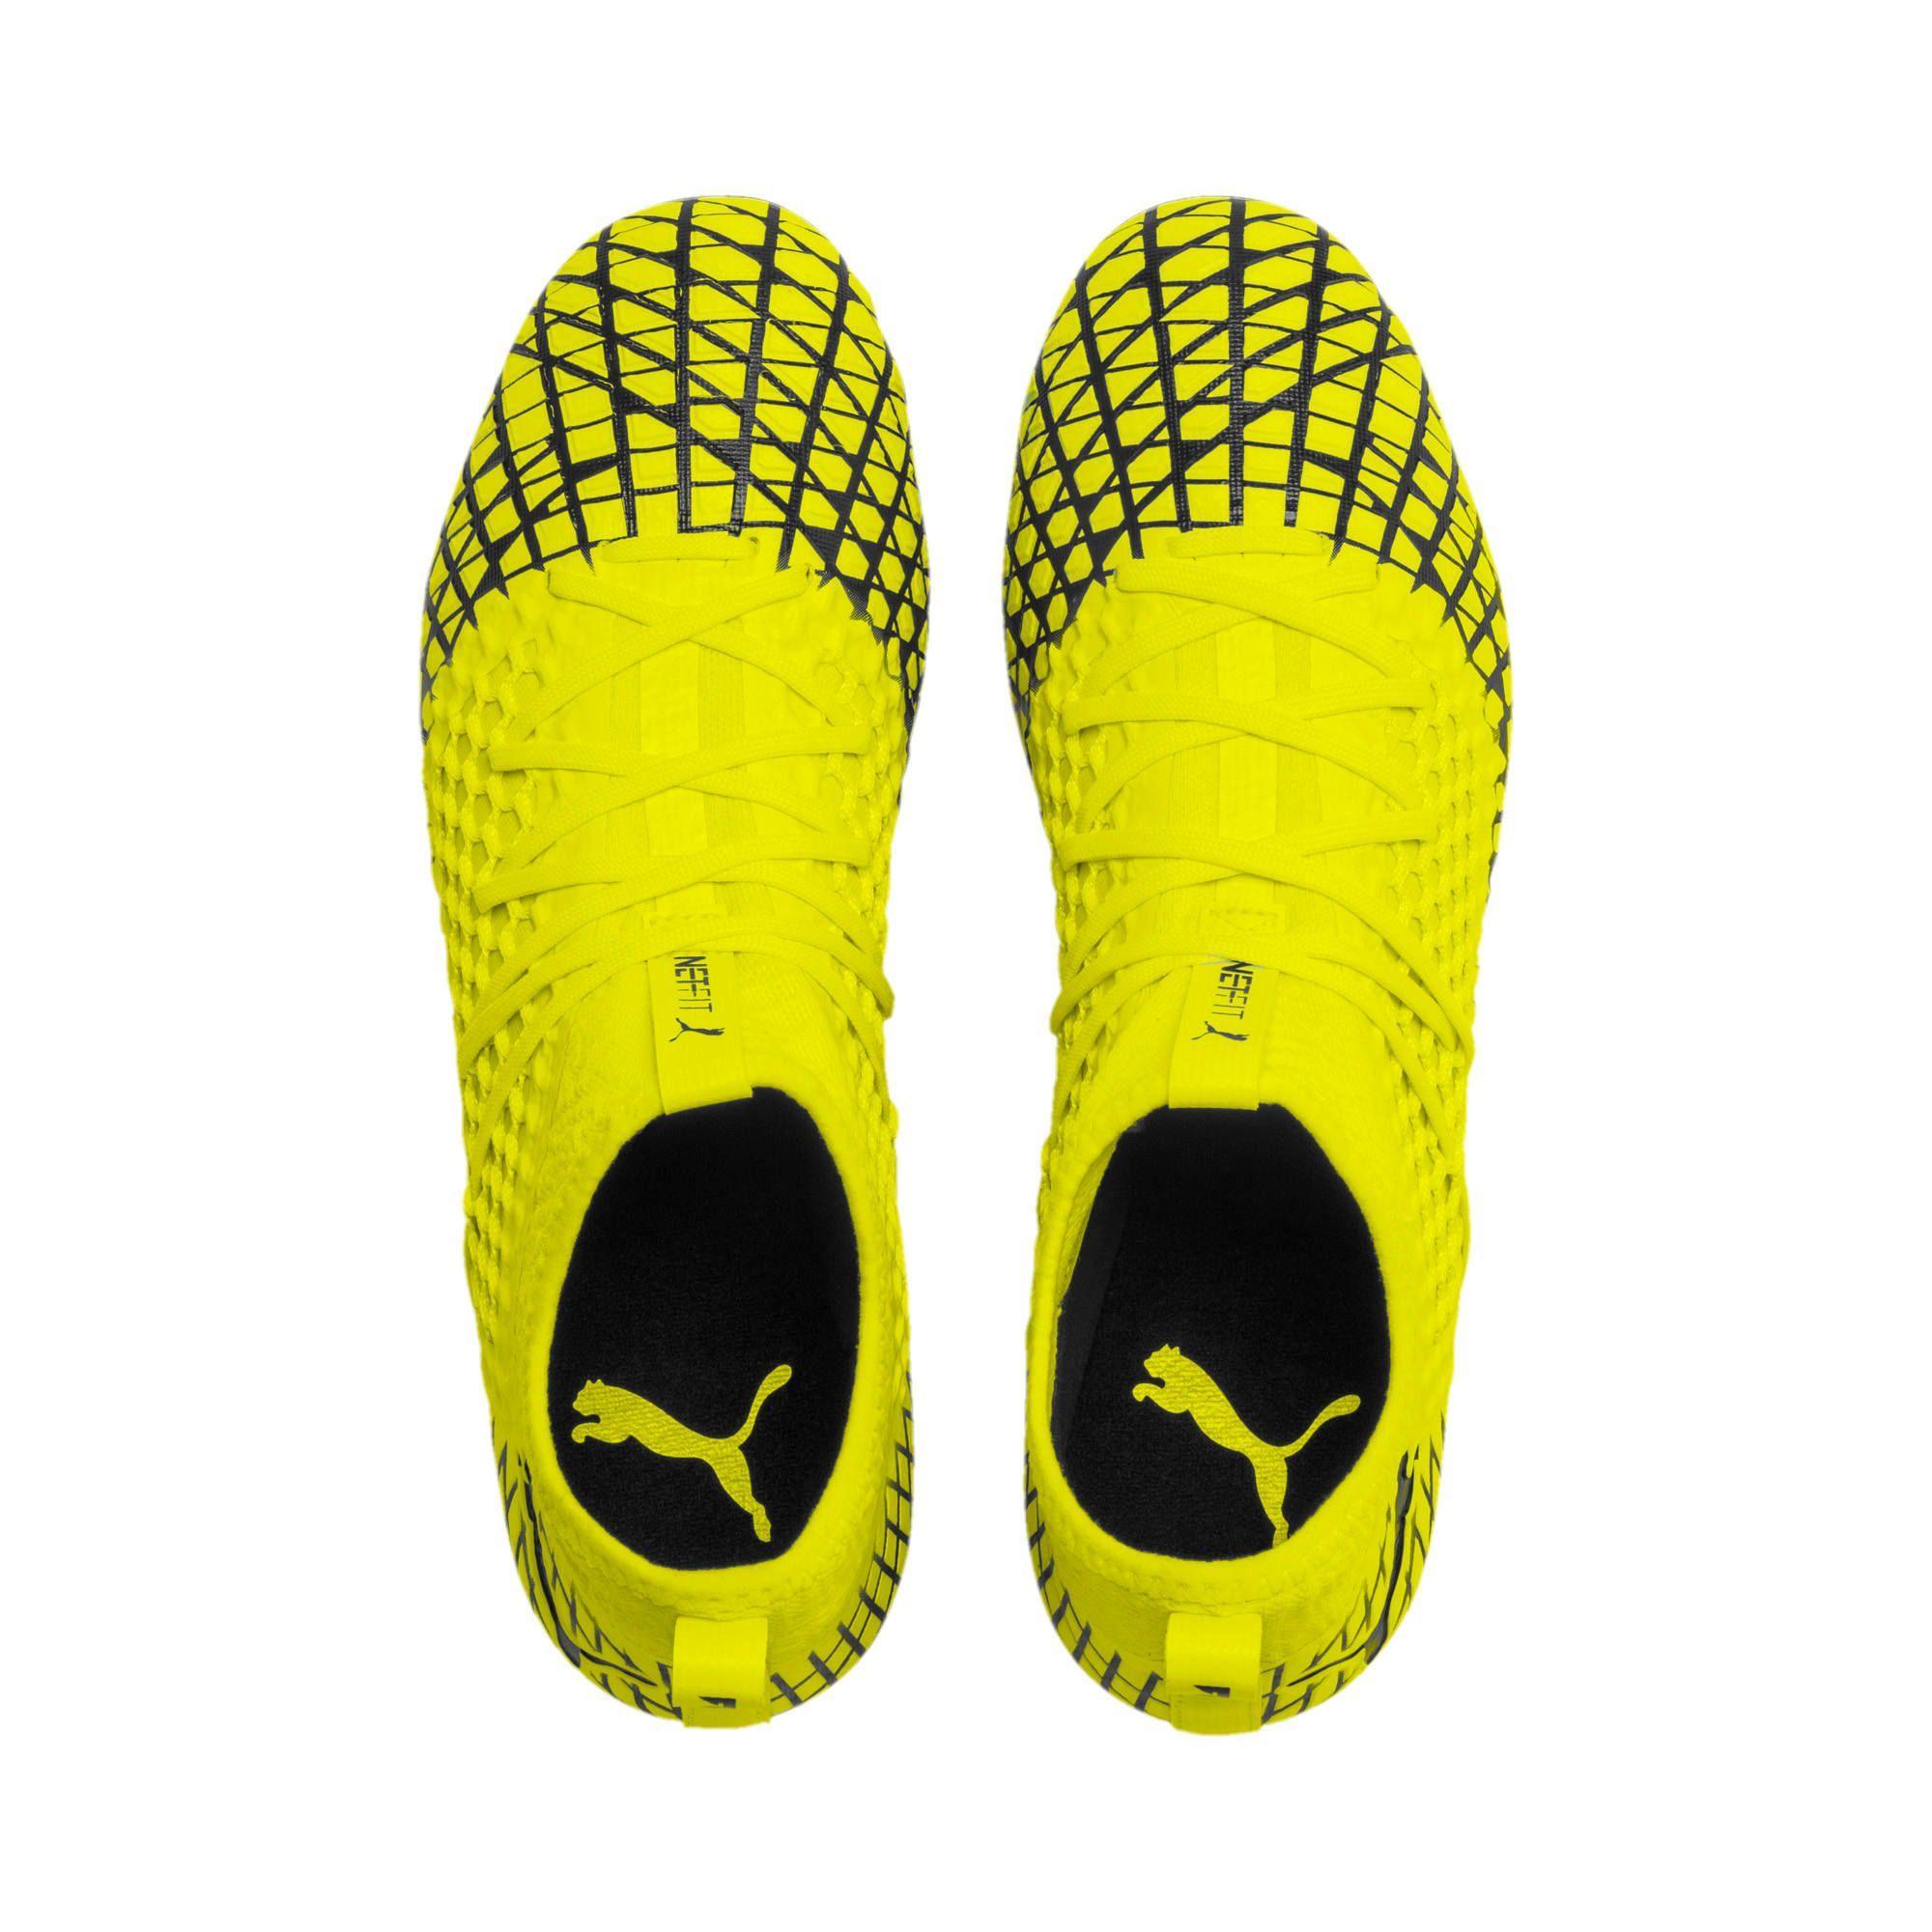 PUMA Future 4.3 NetFit FGAG Men's Football Boots in Yellow